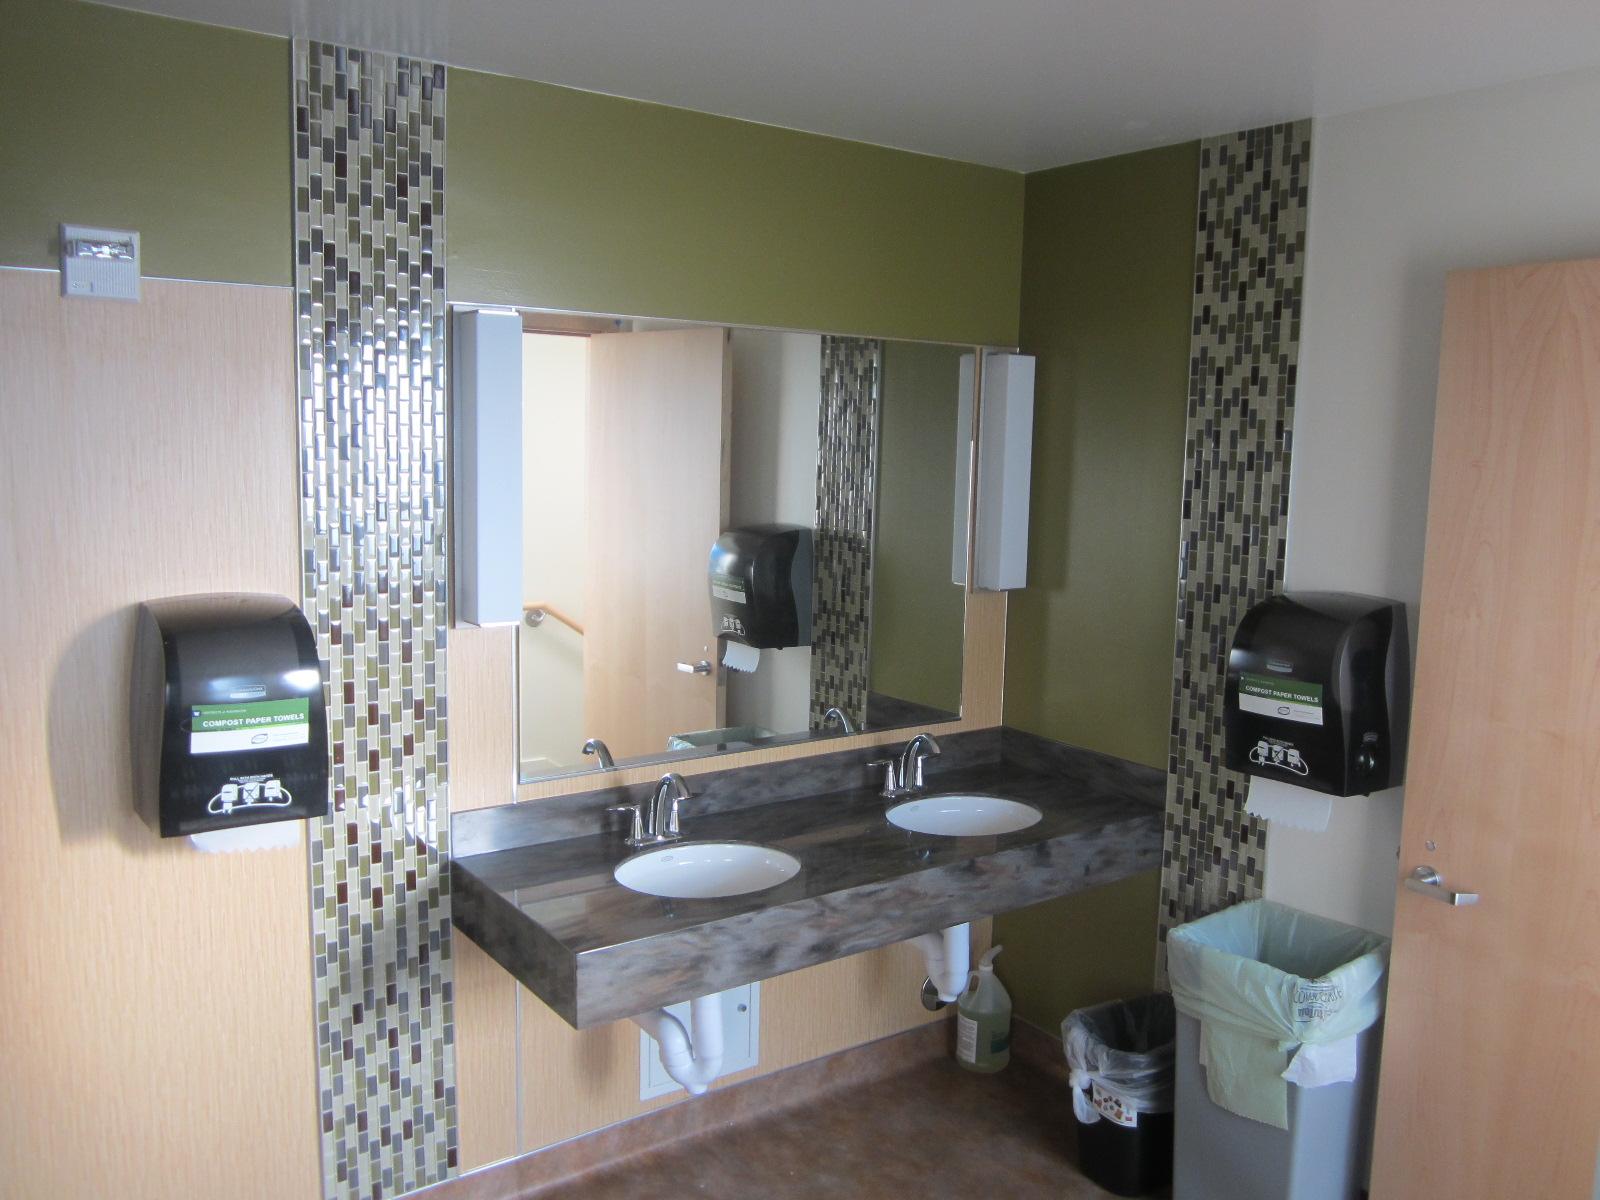 Commerical - Bathroom.JPG